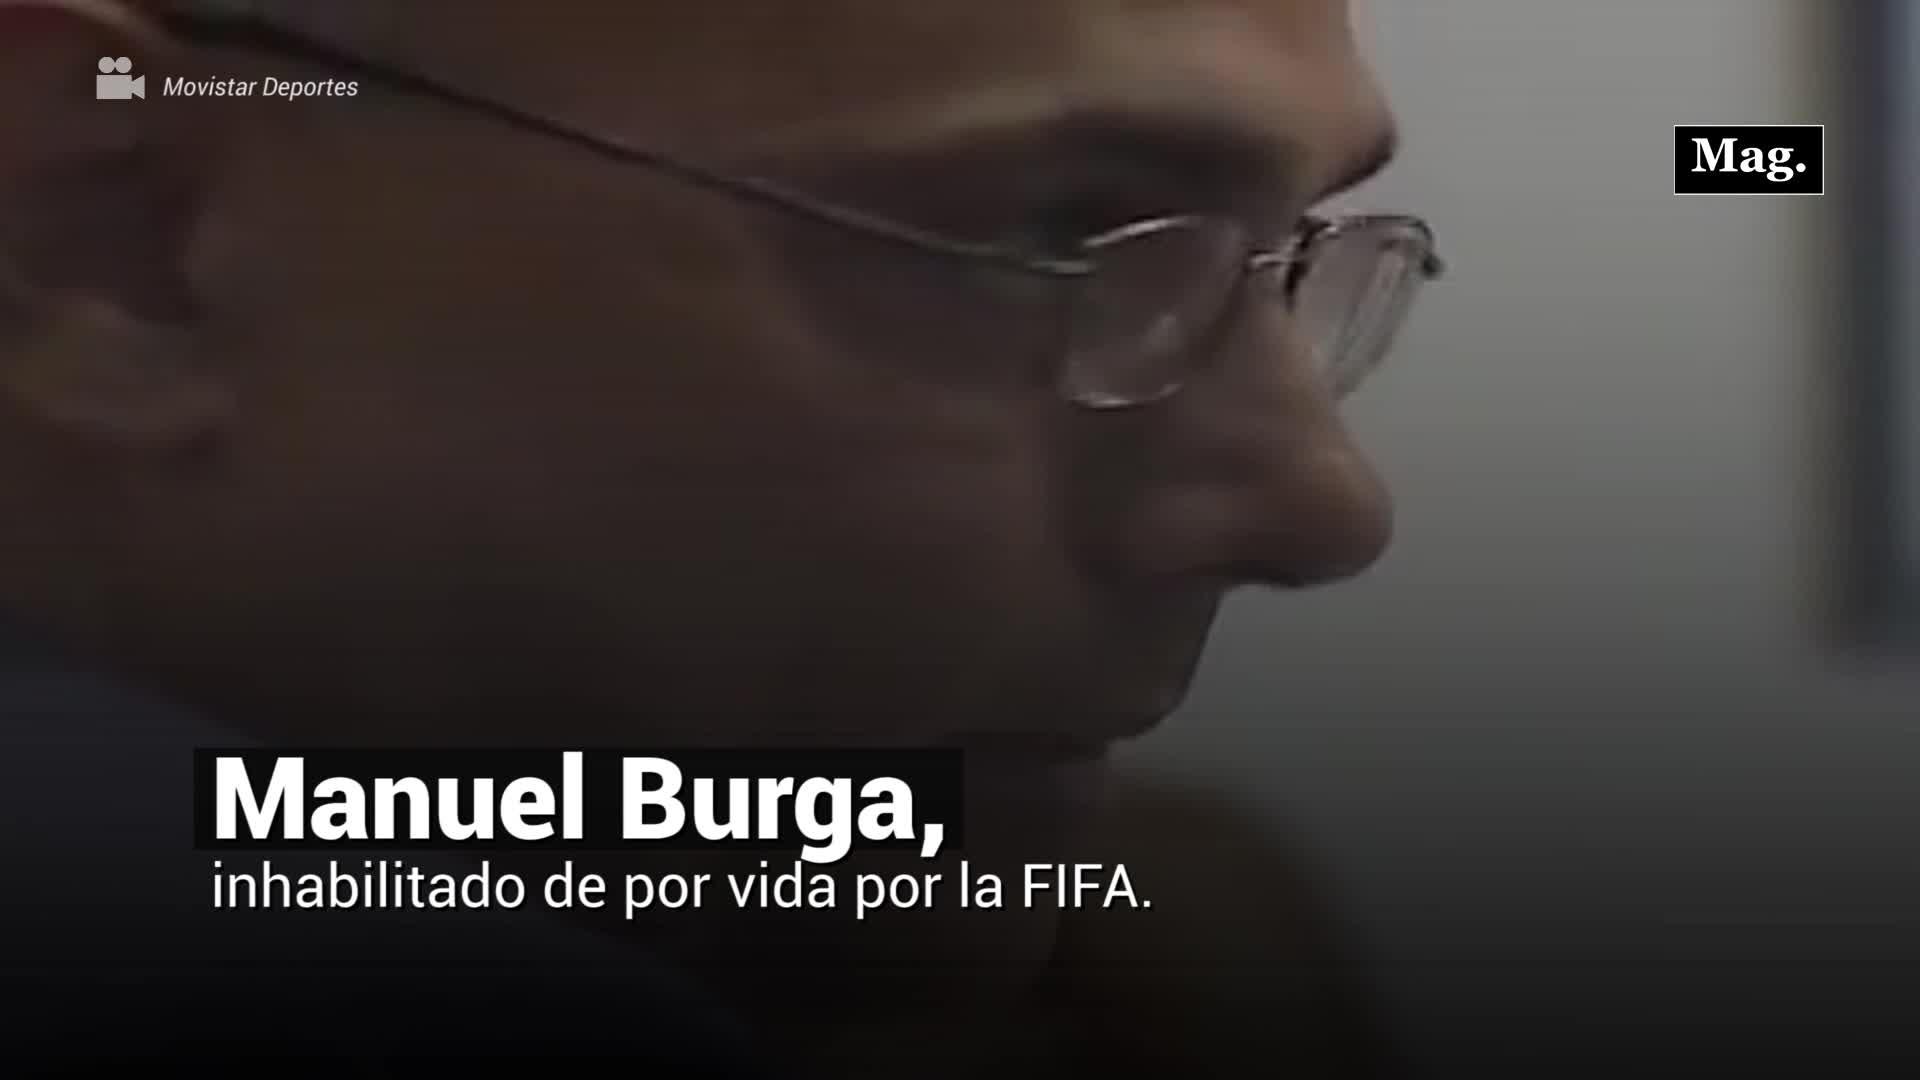 Manuel Burga, inhabilitado de por vida